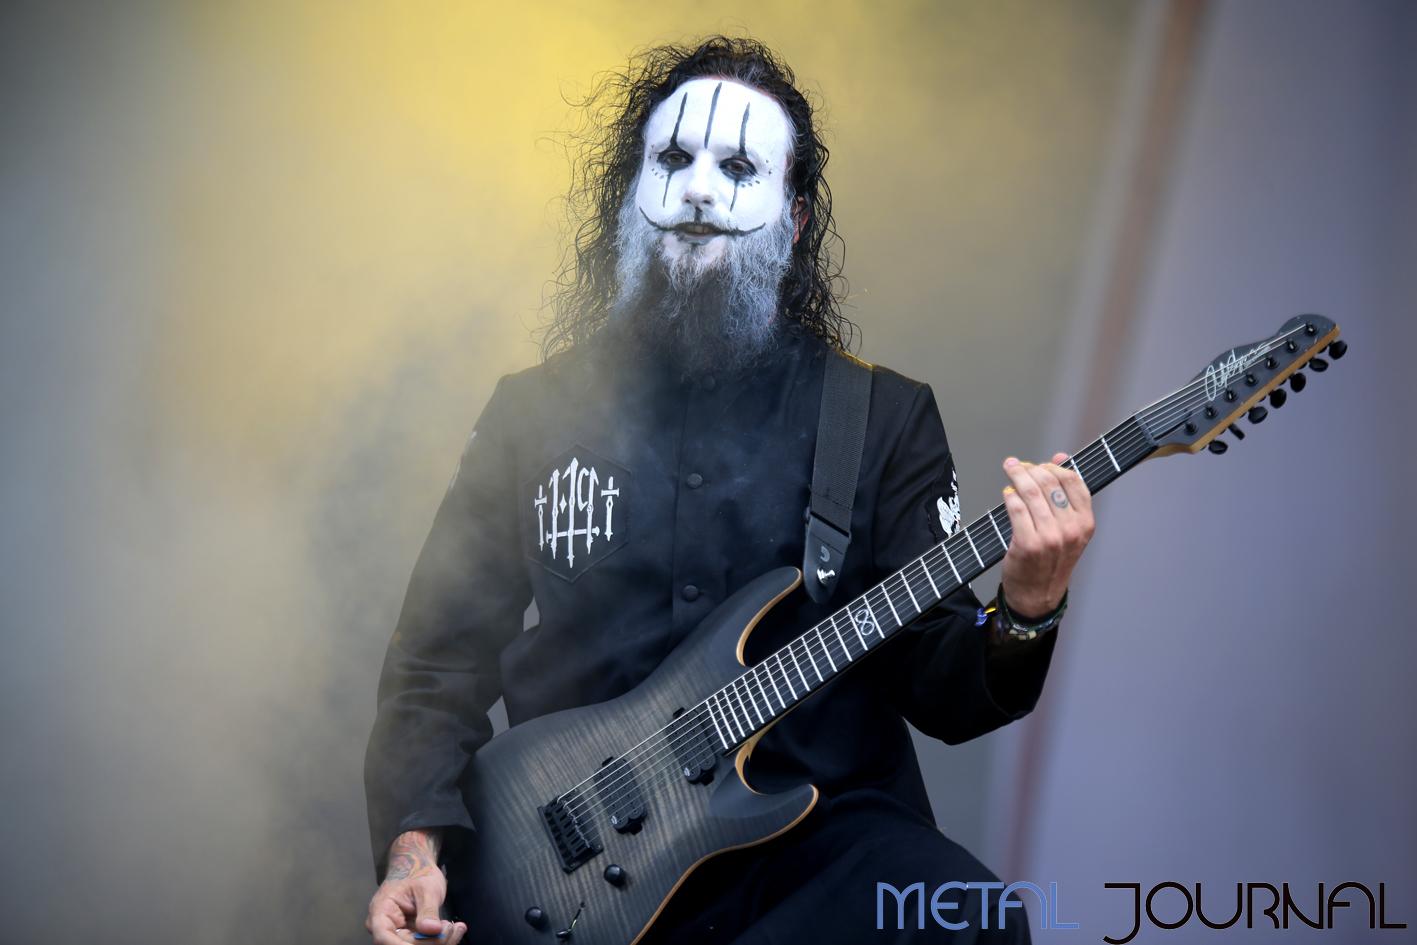 lacuna coil rock fest 18 - metal journal pic 4